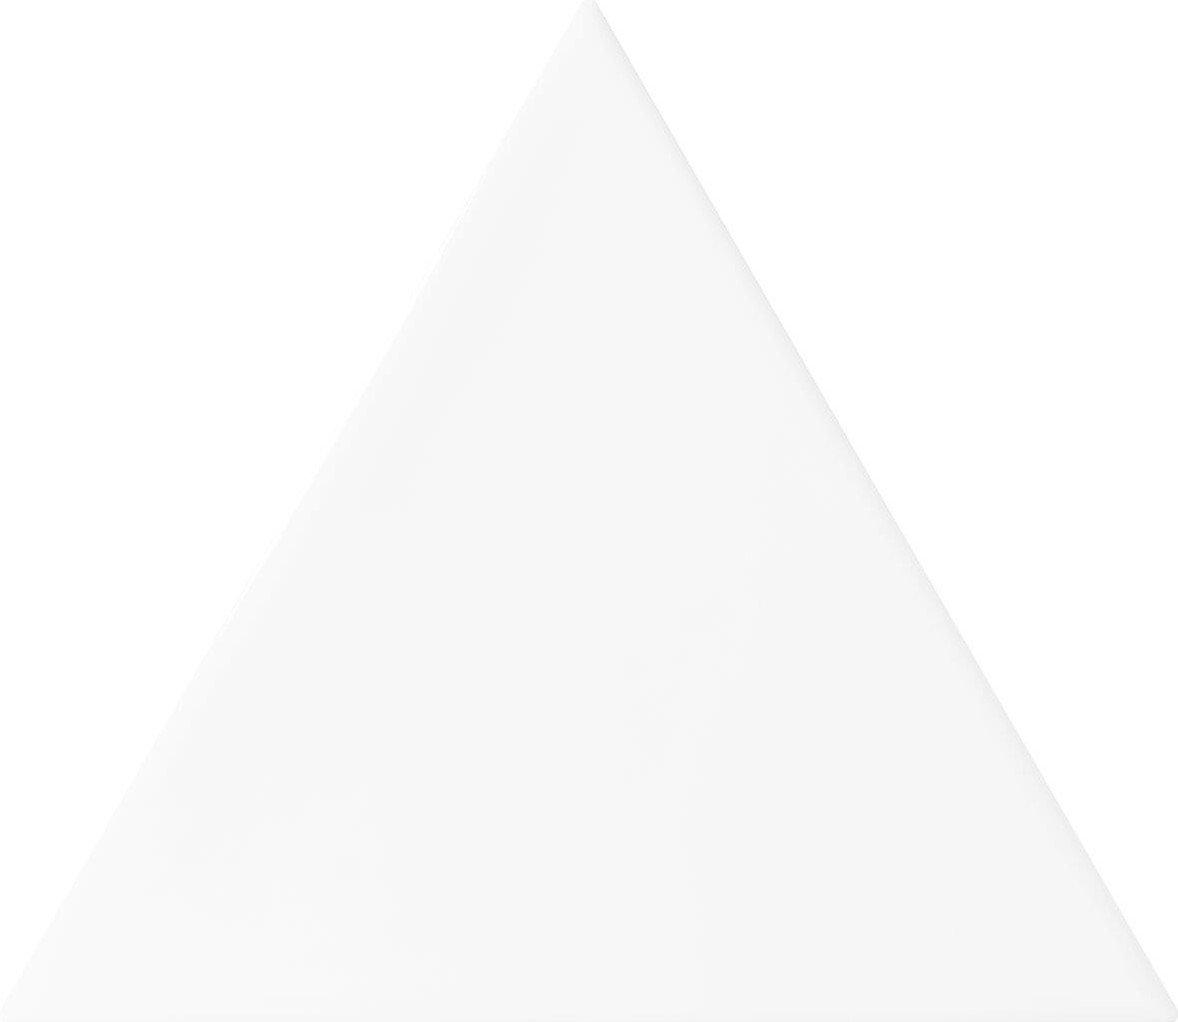 Quintessenza 3LATI driehoek tegel 13,2x11,4 Bianco Lucido